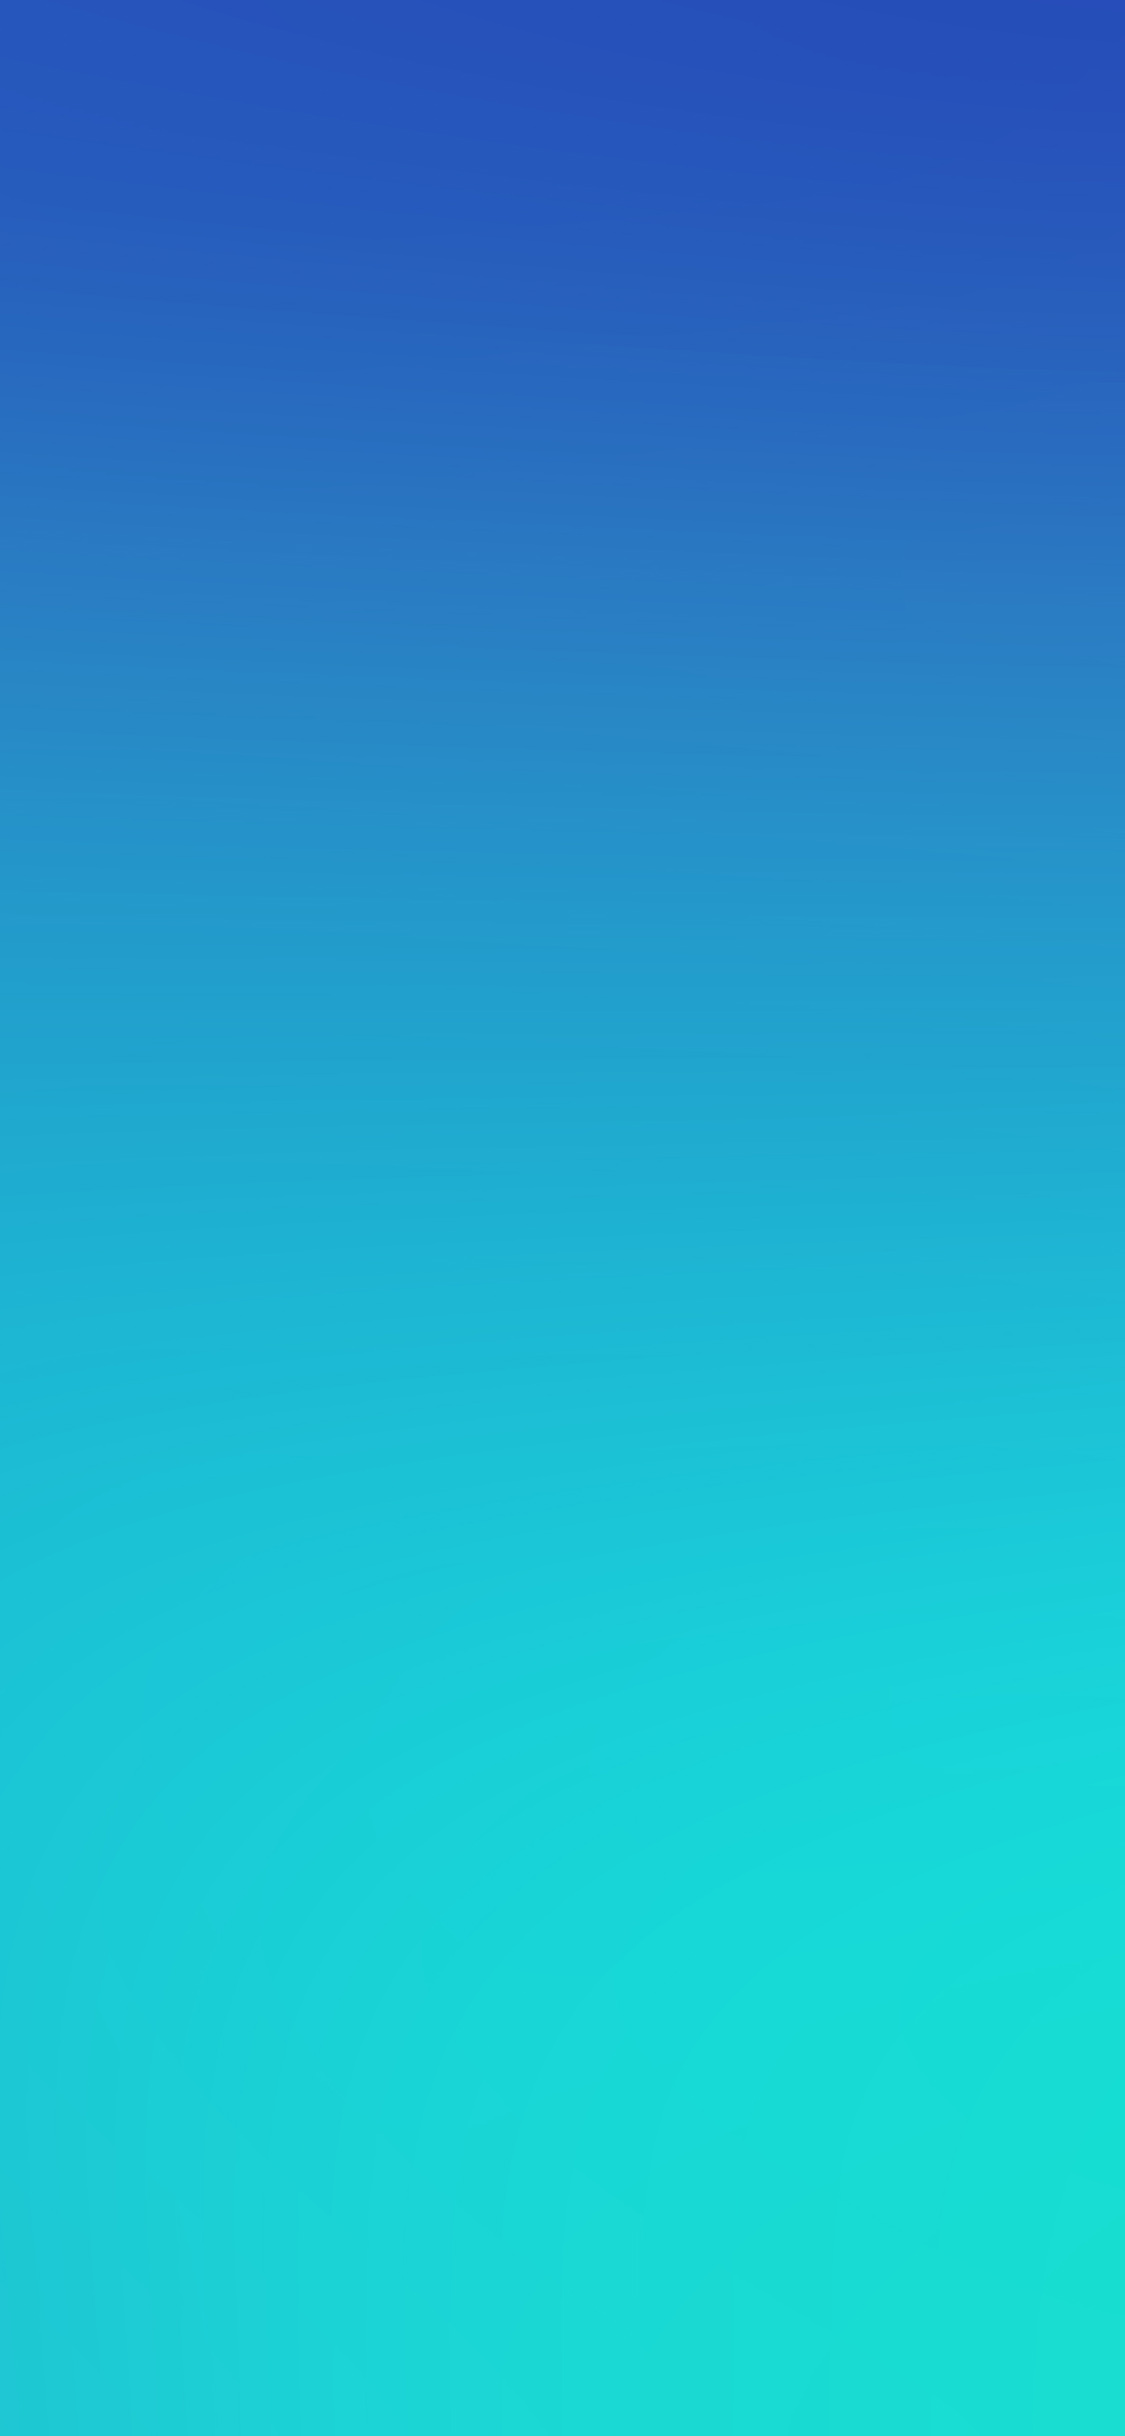 iphonepapers com iphone 8 wallpaper si49 blue sky blue gradation